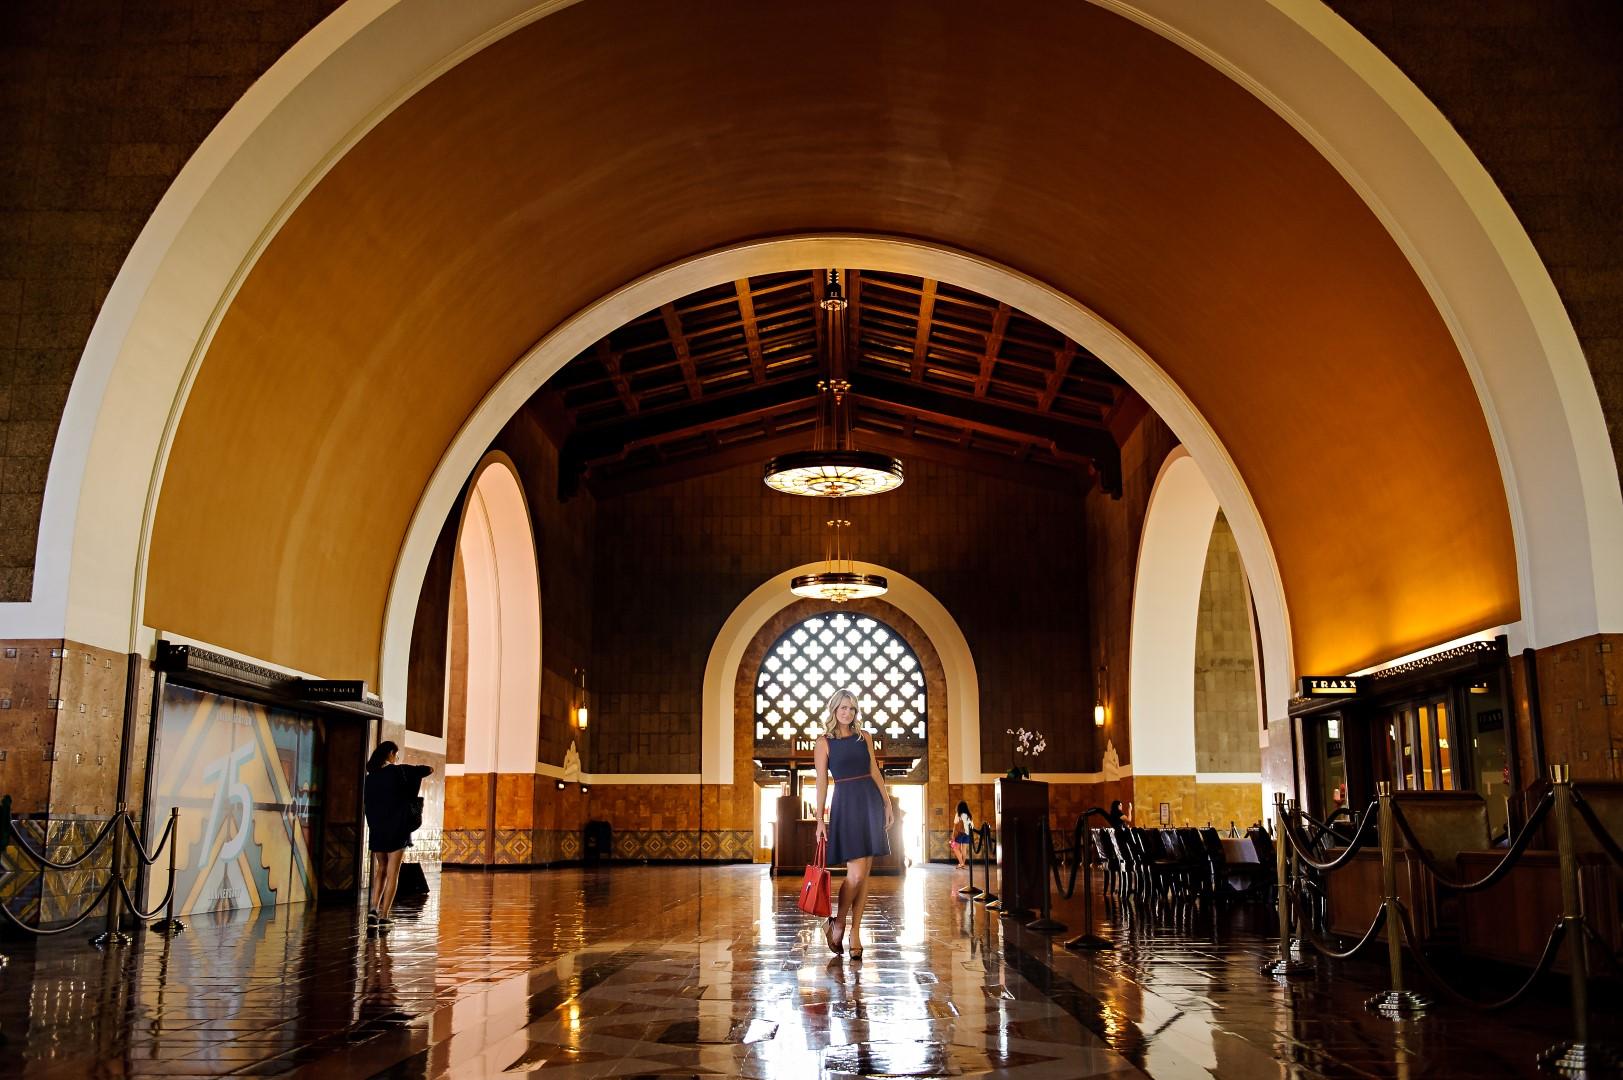 Ask A Concierge – Private Tours Are The BEST Way to Explore LA